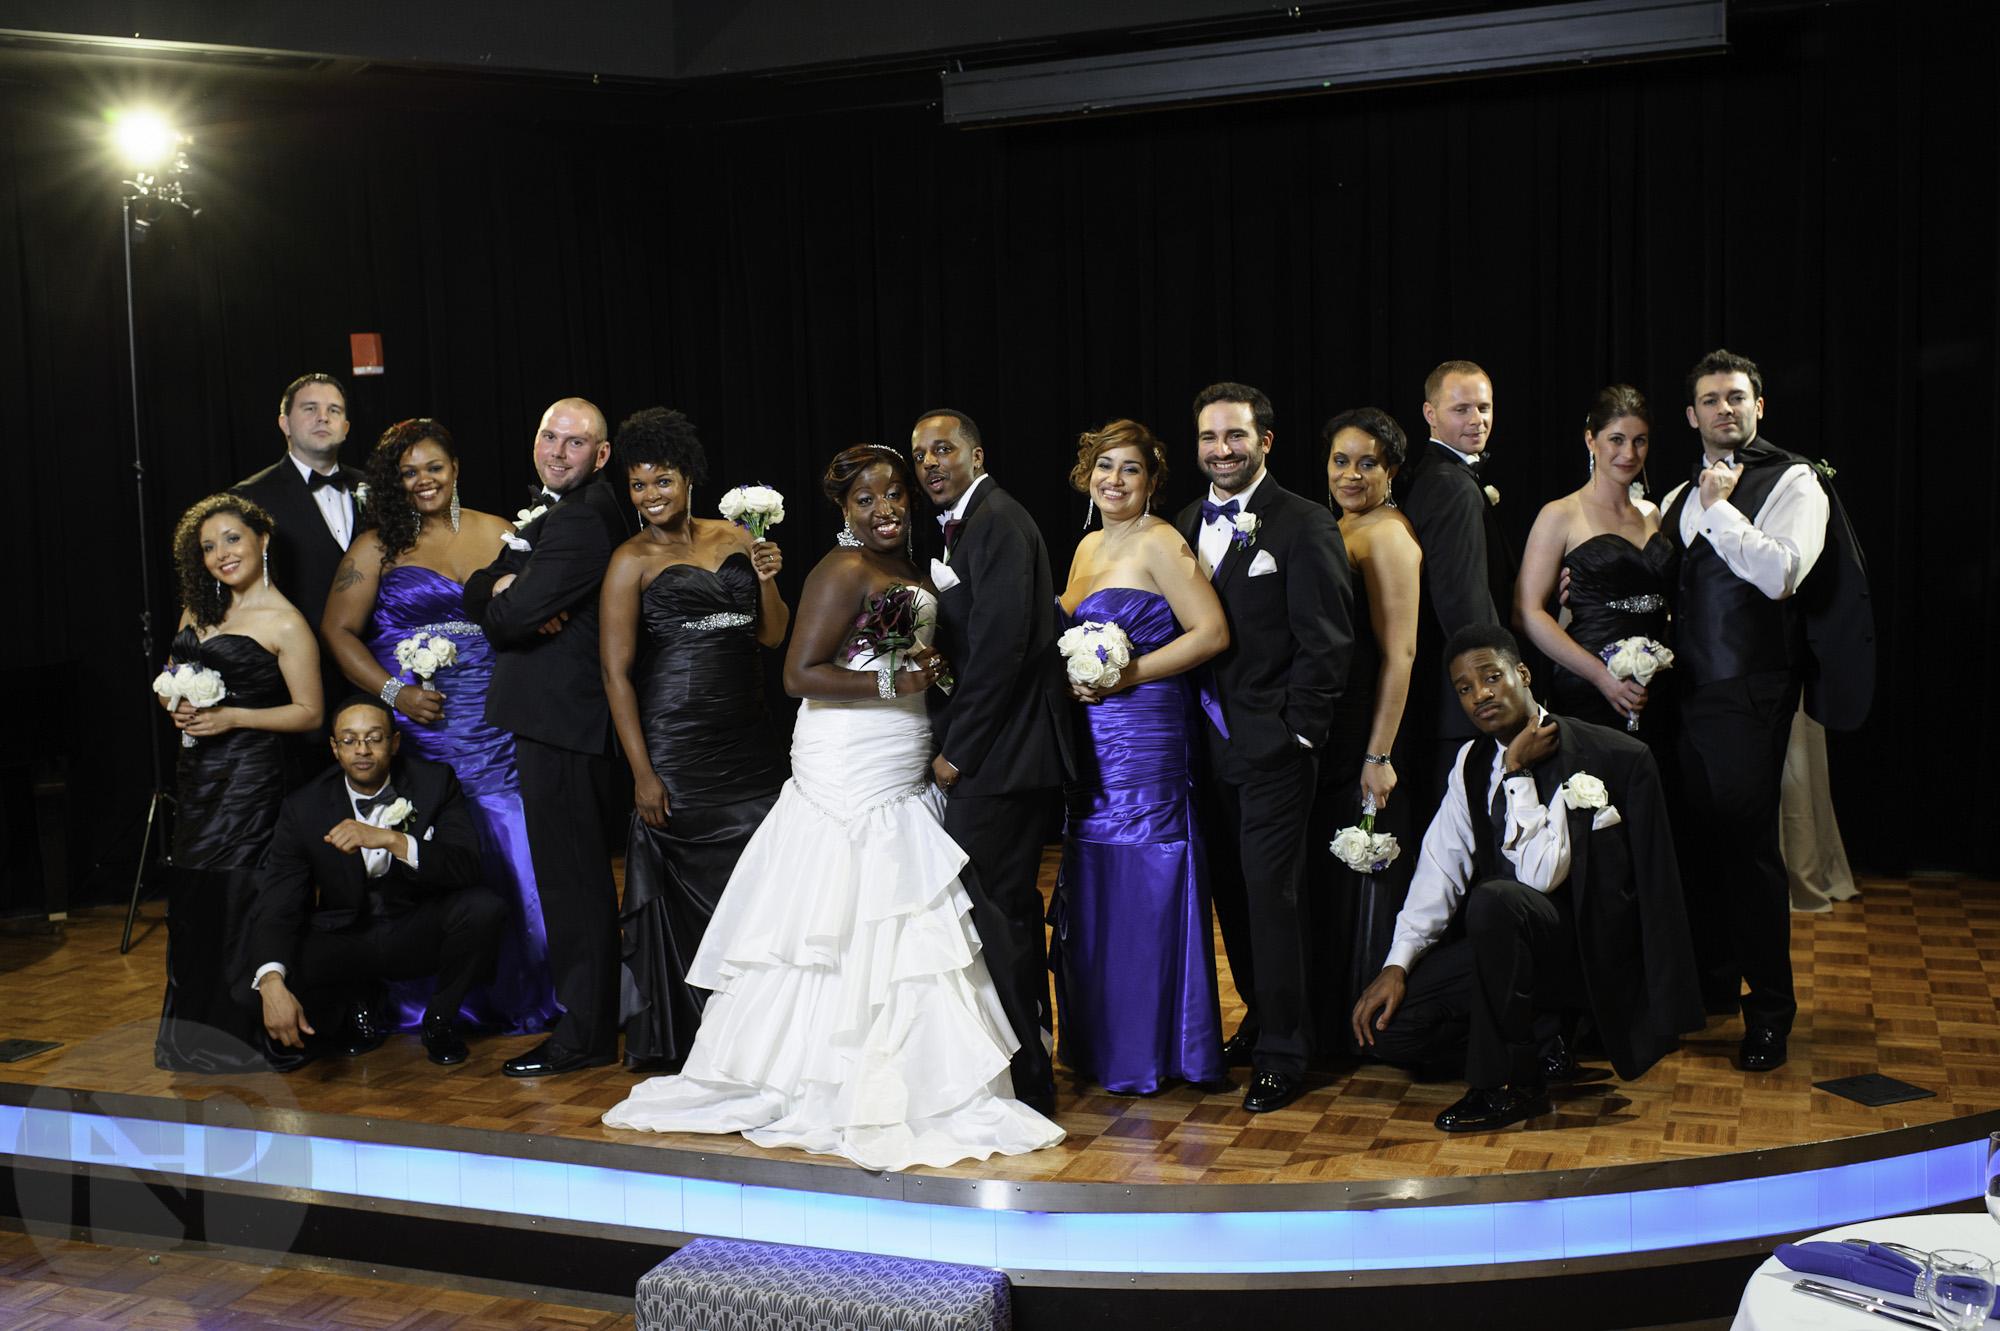 wedding photography dc photographer - district of columbia photography weddingphoto 2012_ denis kaleigh -  emerald isle - destination wedding - Rustin Kratel Carlyle Club Alexandria VA-42.jpg